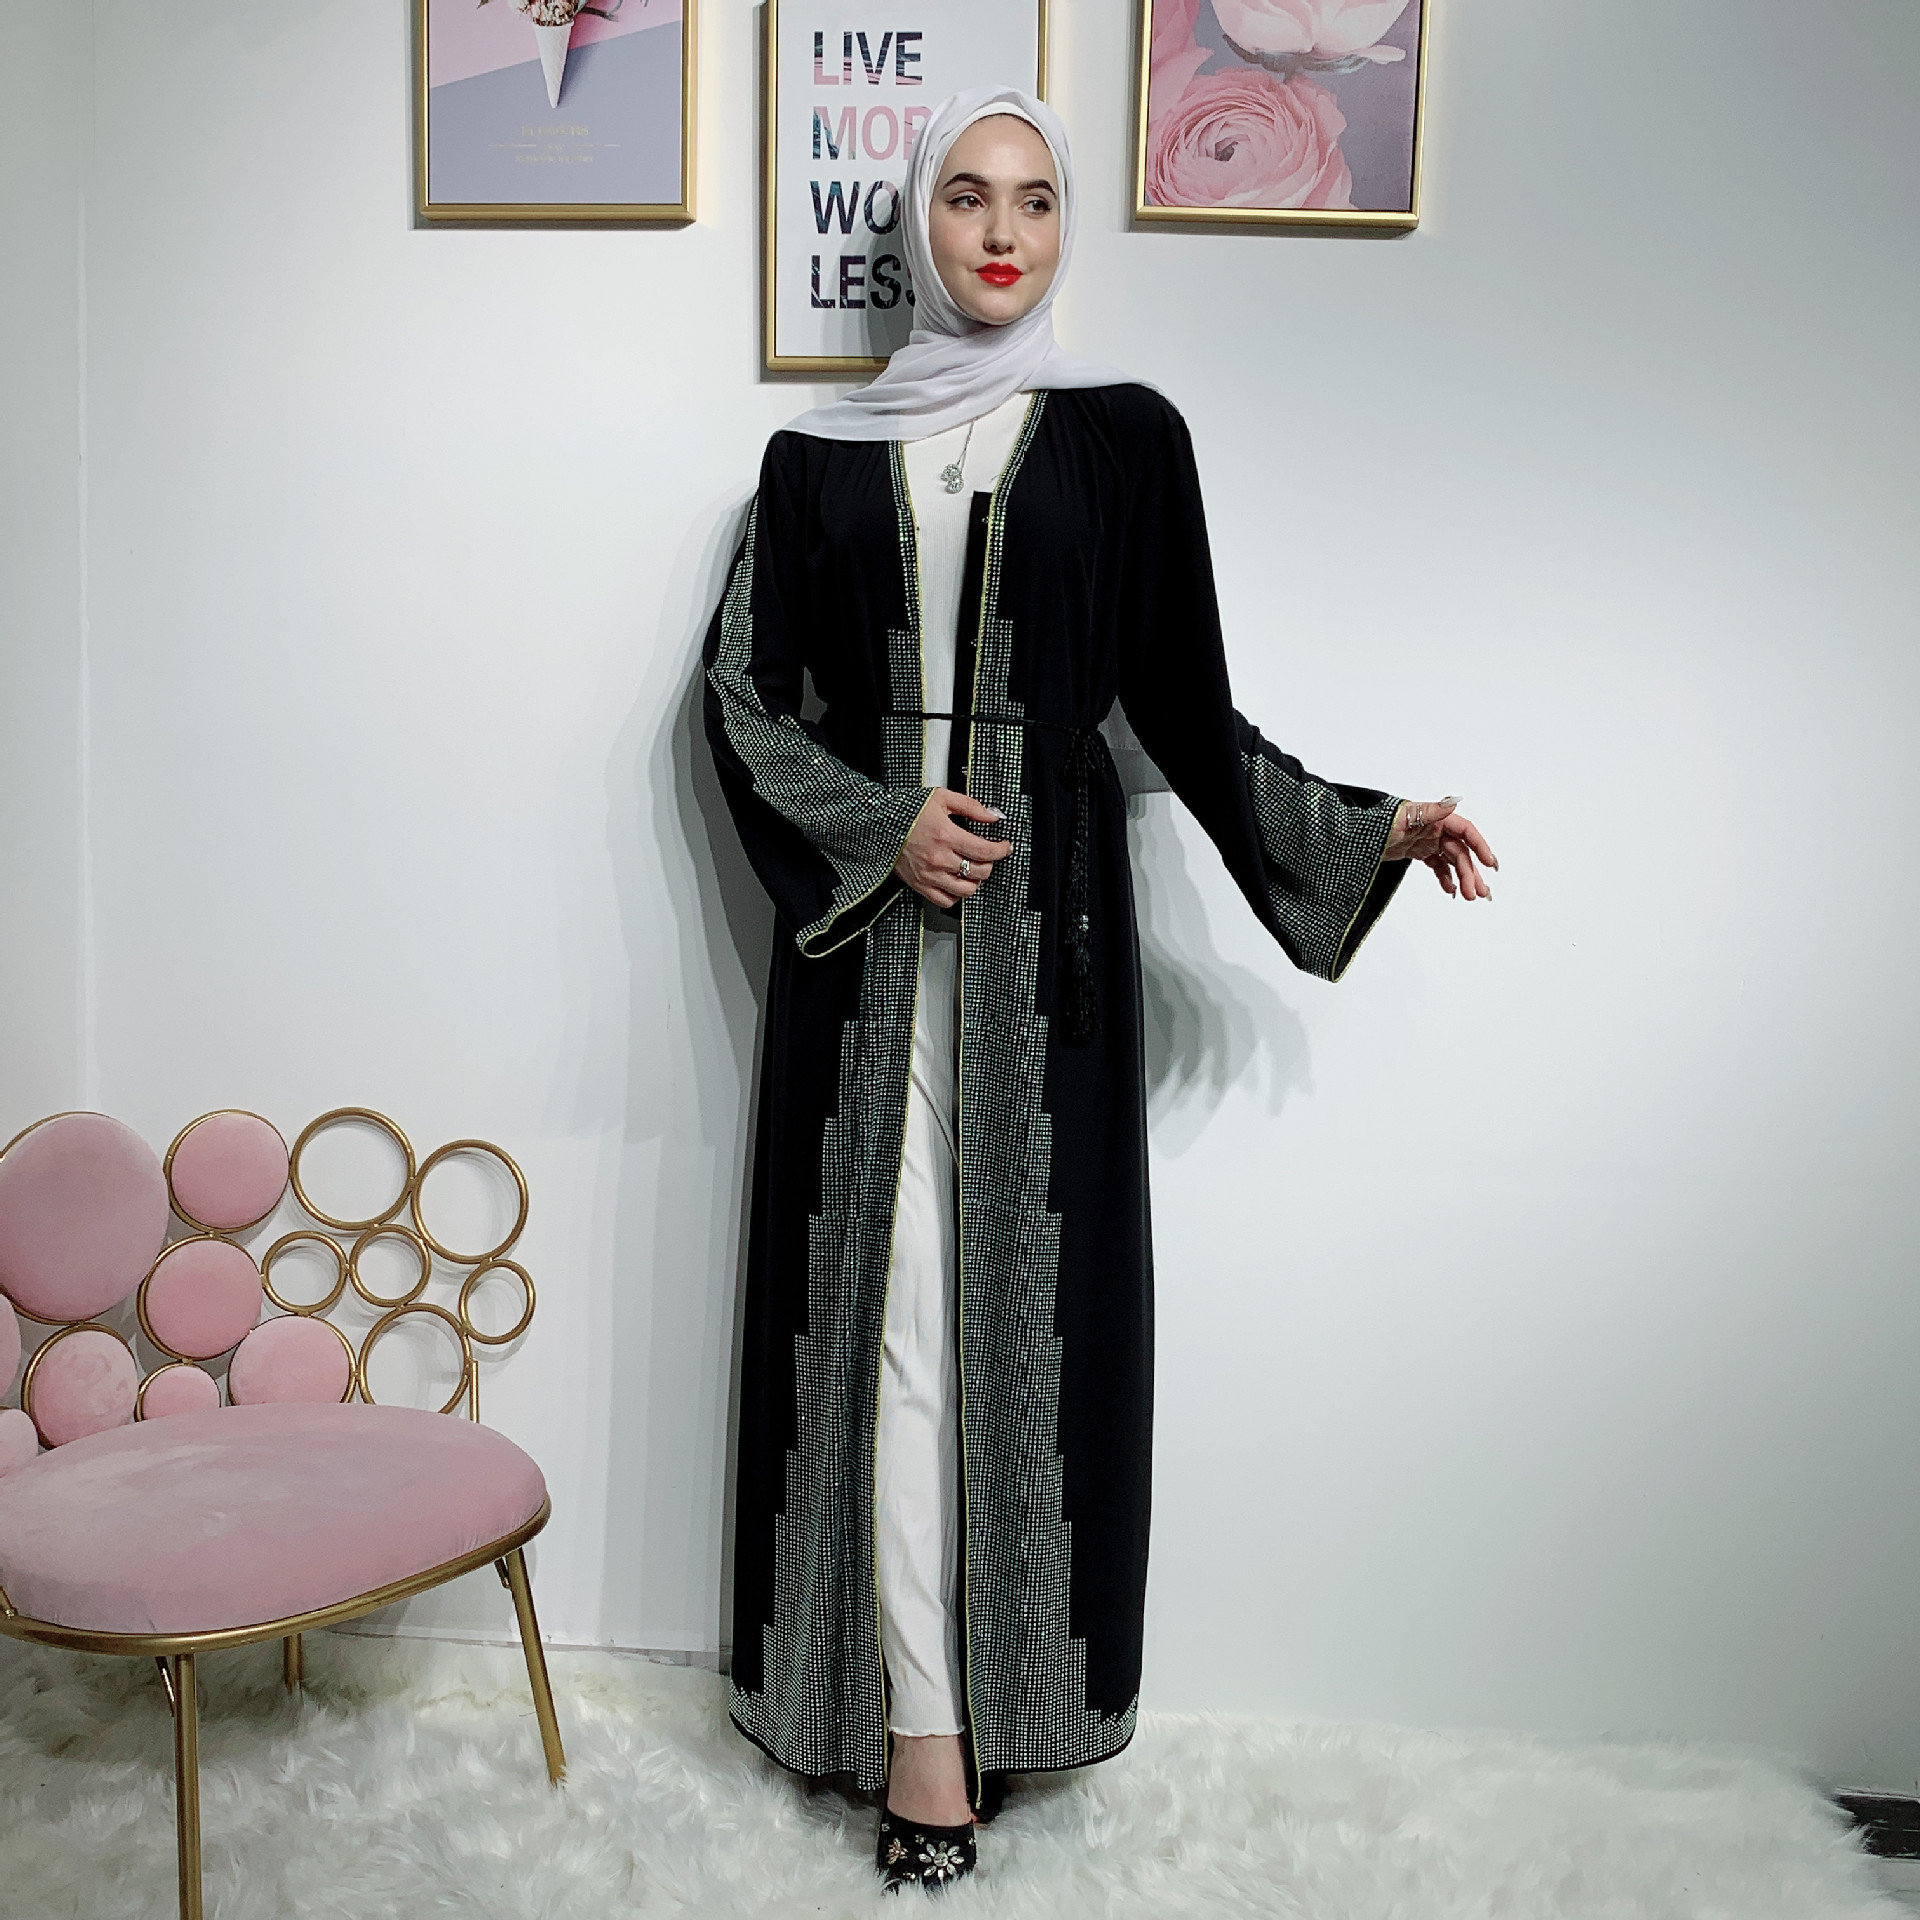 Femmes musulman Abaya robe rouge/noir élégant diamants Club robe de soirée Oman arabe vêtements femme Jilbab robe Caftan Marocain